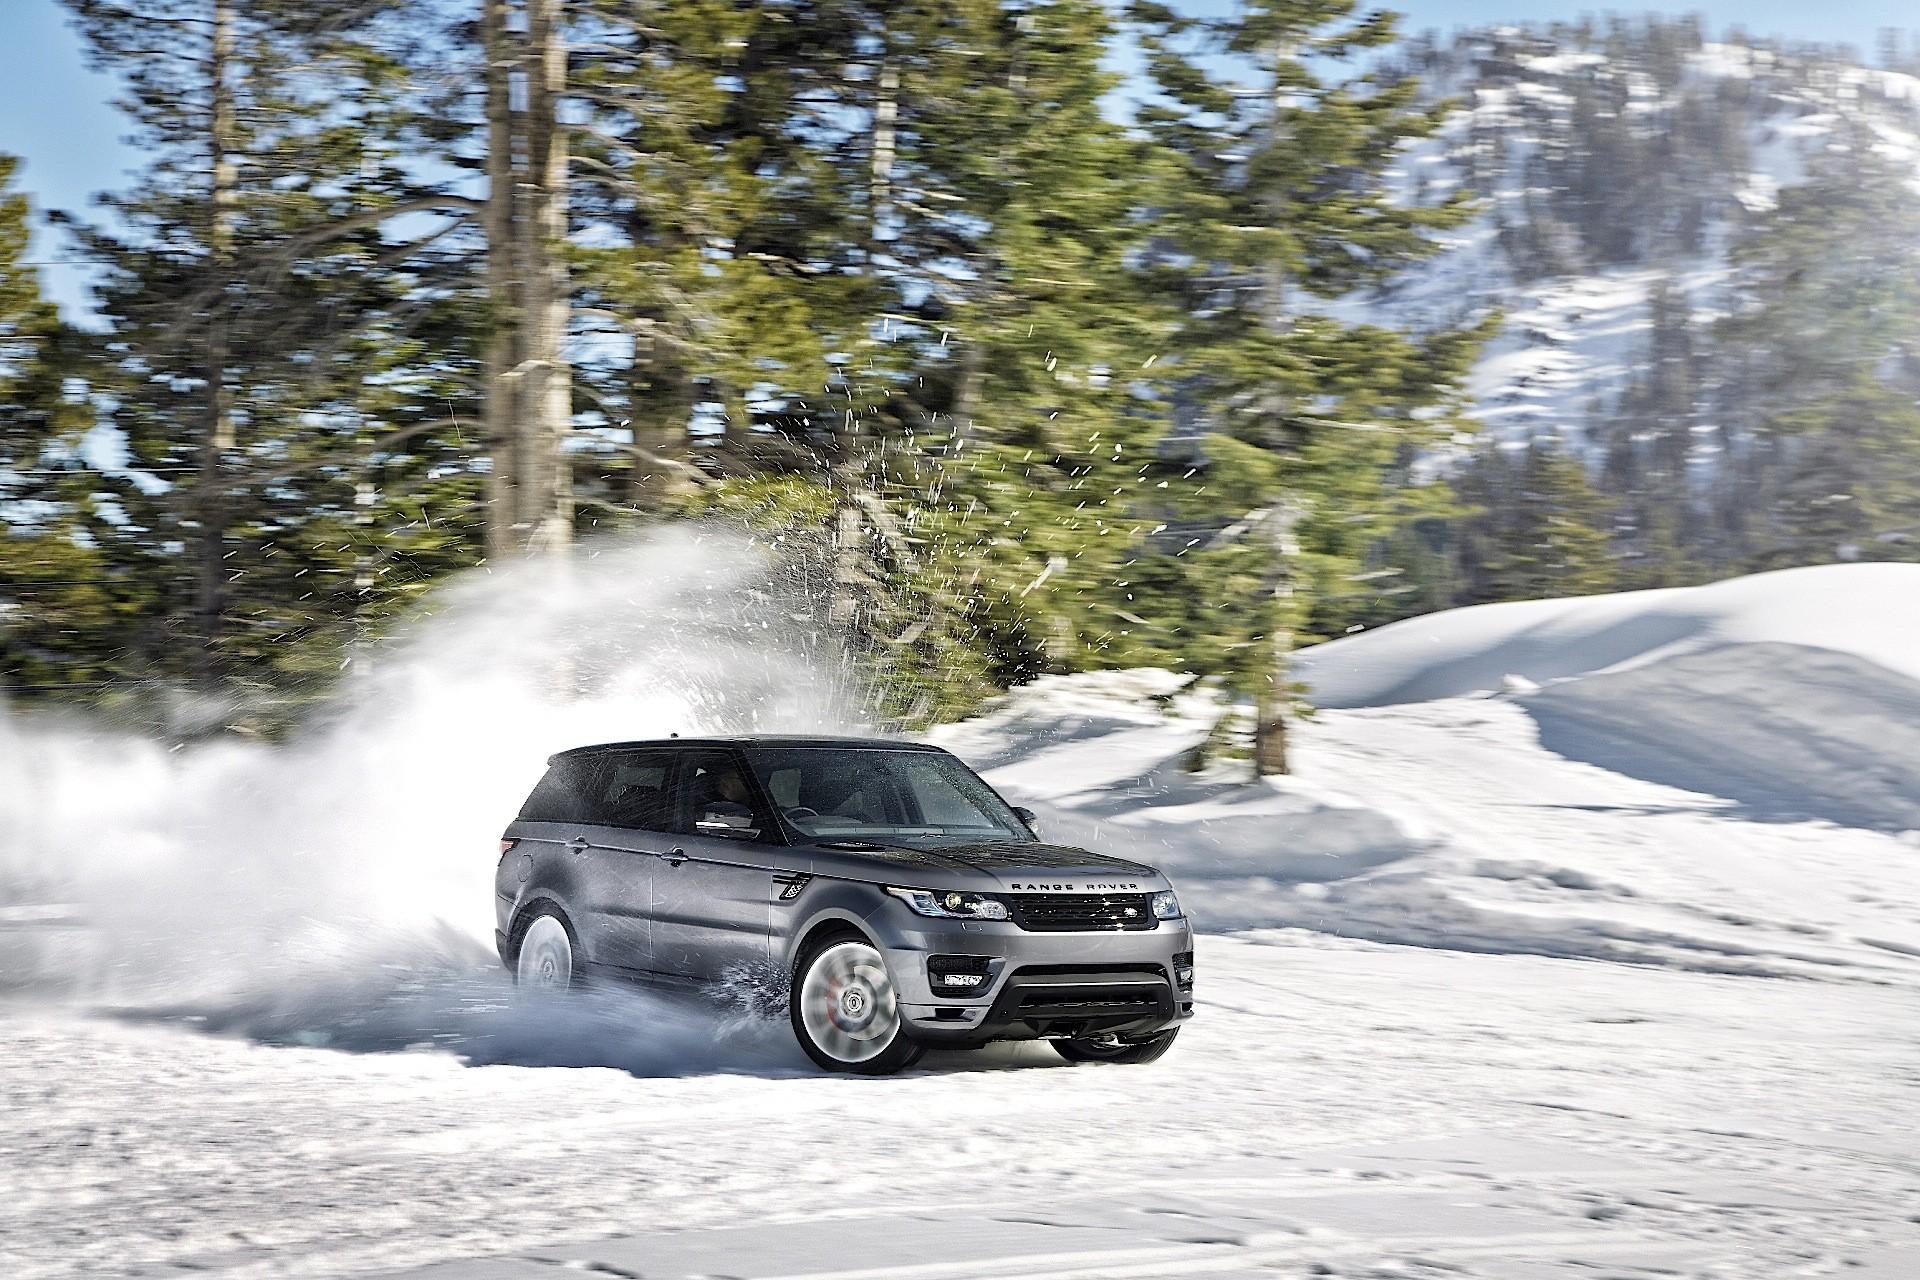 https://s1.cdn.autoevolution.com/images/news/gallery/2016-range-rover-sport-diesel-to-cost-66450-photo-gallery_1.jpg